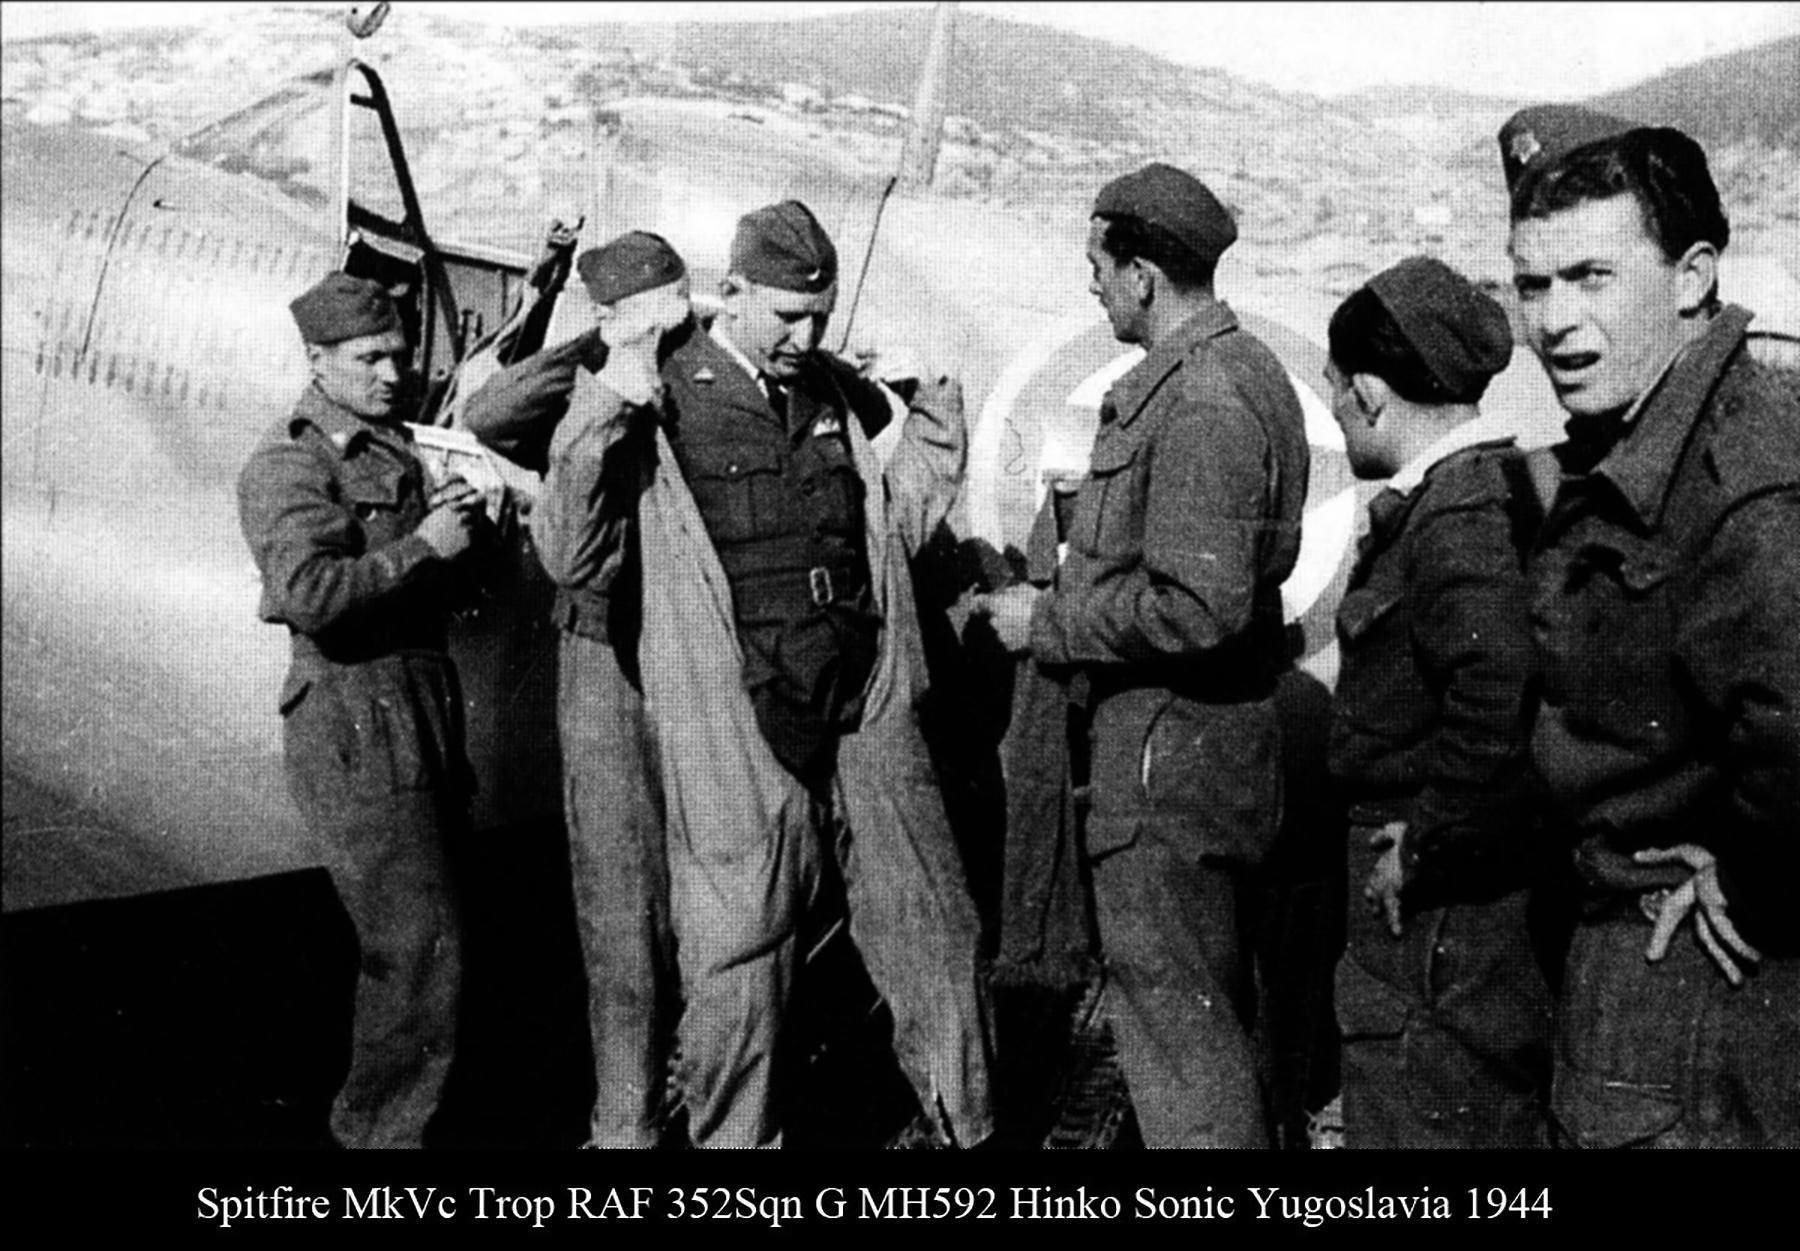 Spitfire MkVcTrop RAF 352Sqn G MH592 Hinko Sonic Yugoslavia 1944 03